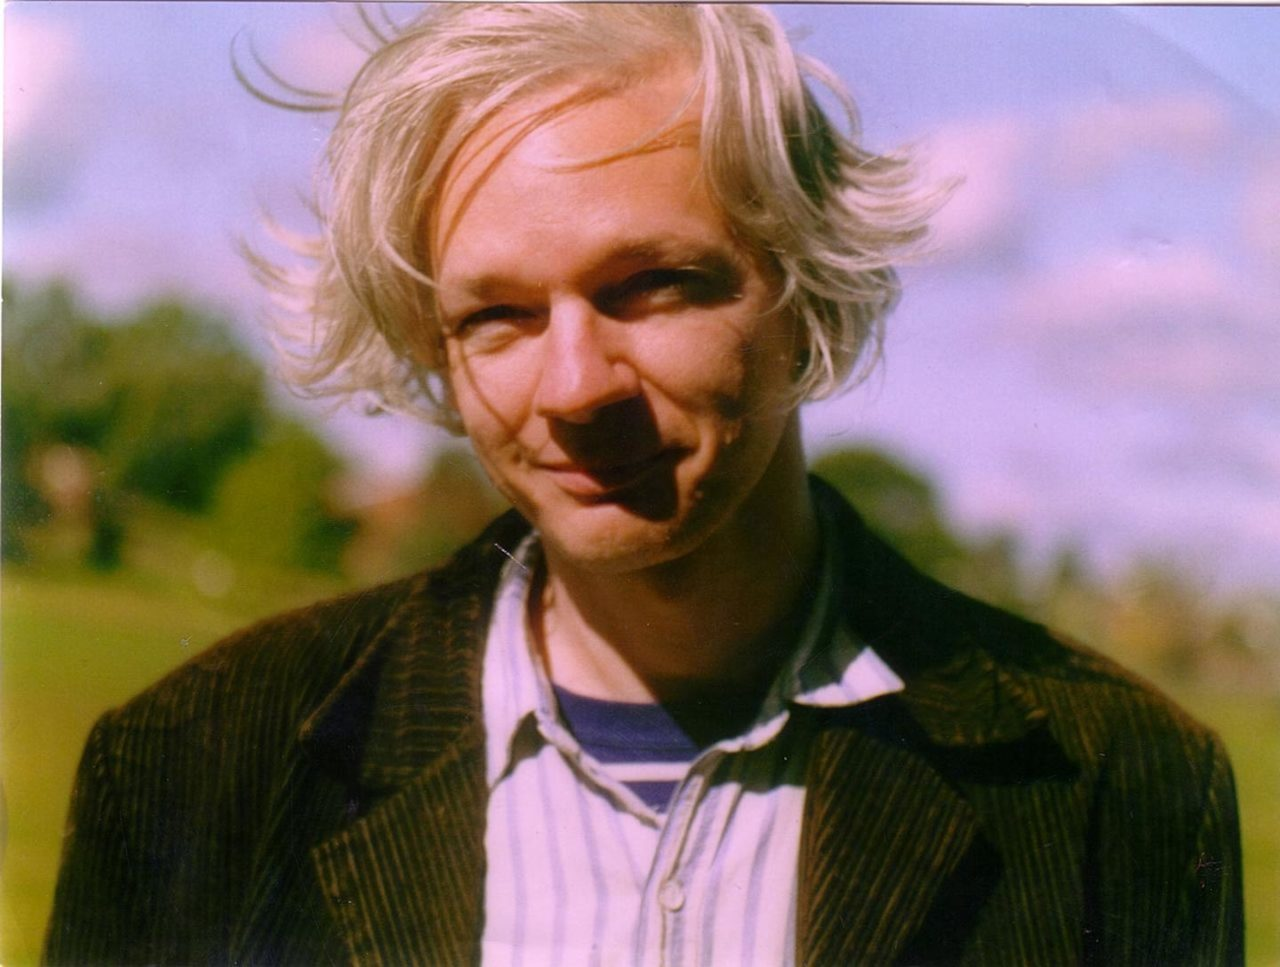 https://thesubmarine.it/wp-content/uploads/2017/05/1280px-Julian_Assange_full-1280x967.jpg